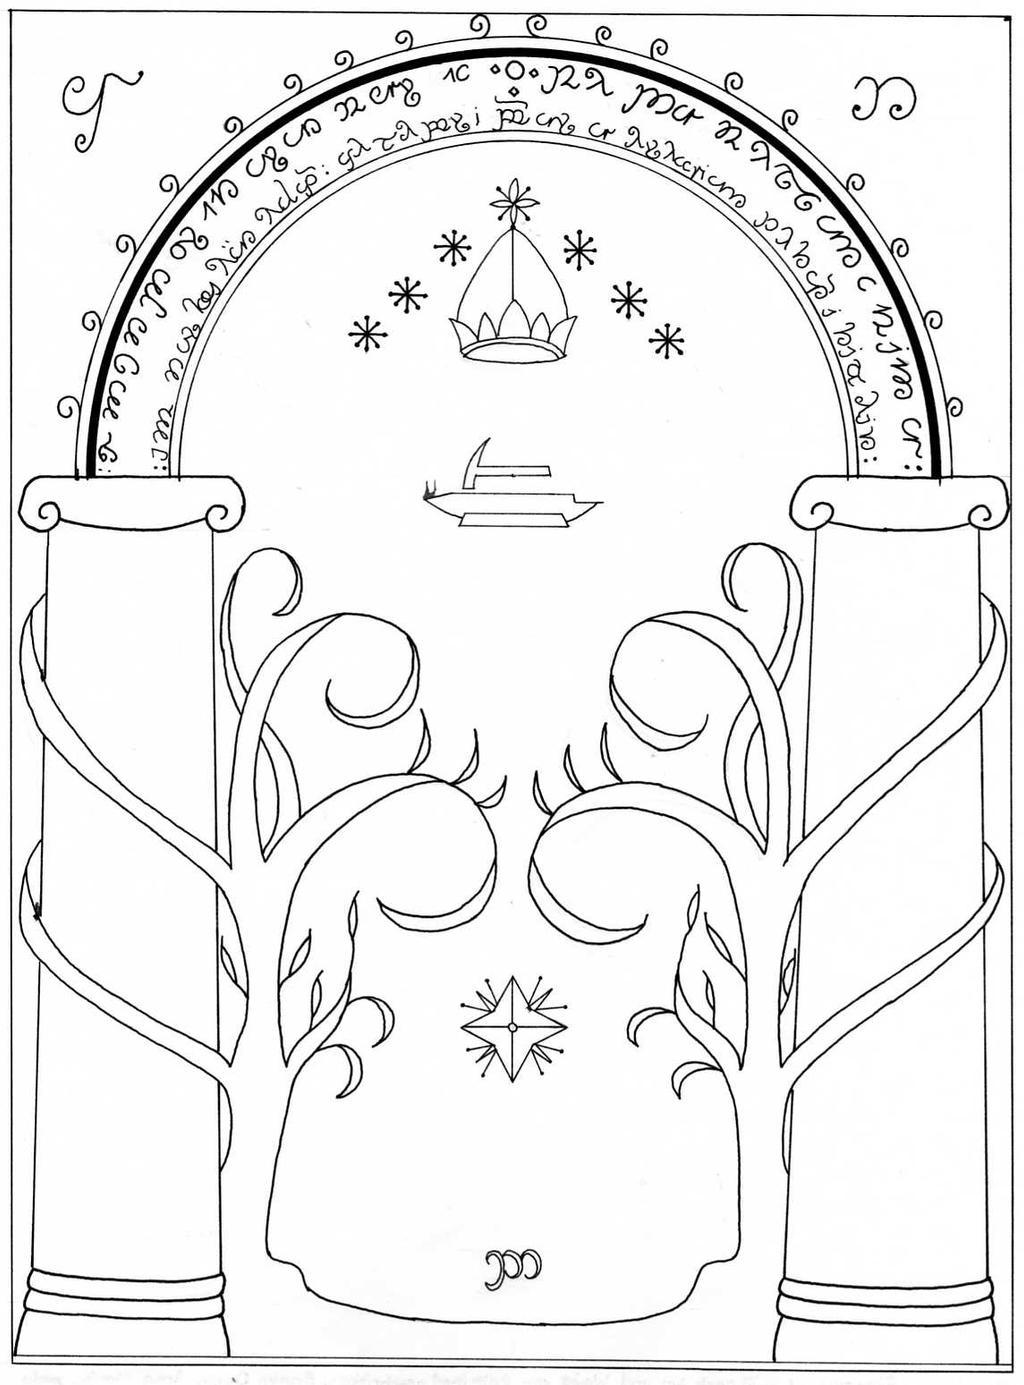 Doors of Durin (aka The West Gate)  sc 1 st  Jillian Tayce & Doors of Durin (aka The West Gate) \u2013 Jillian Tayce